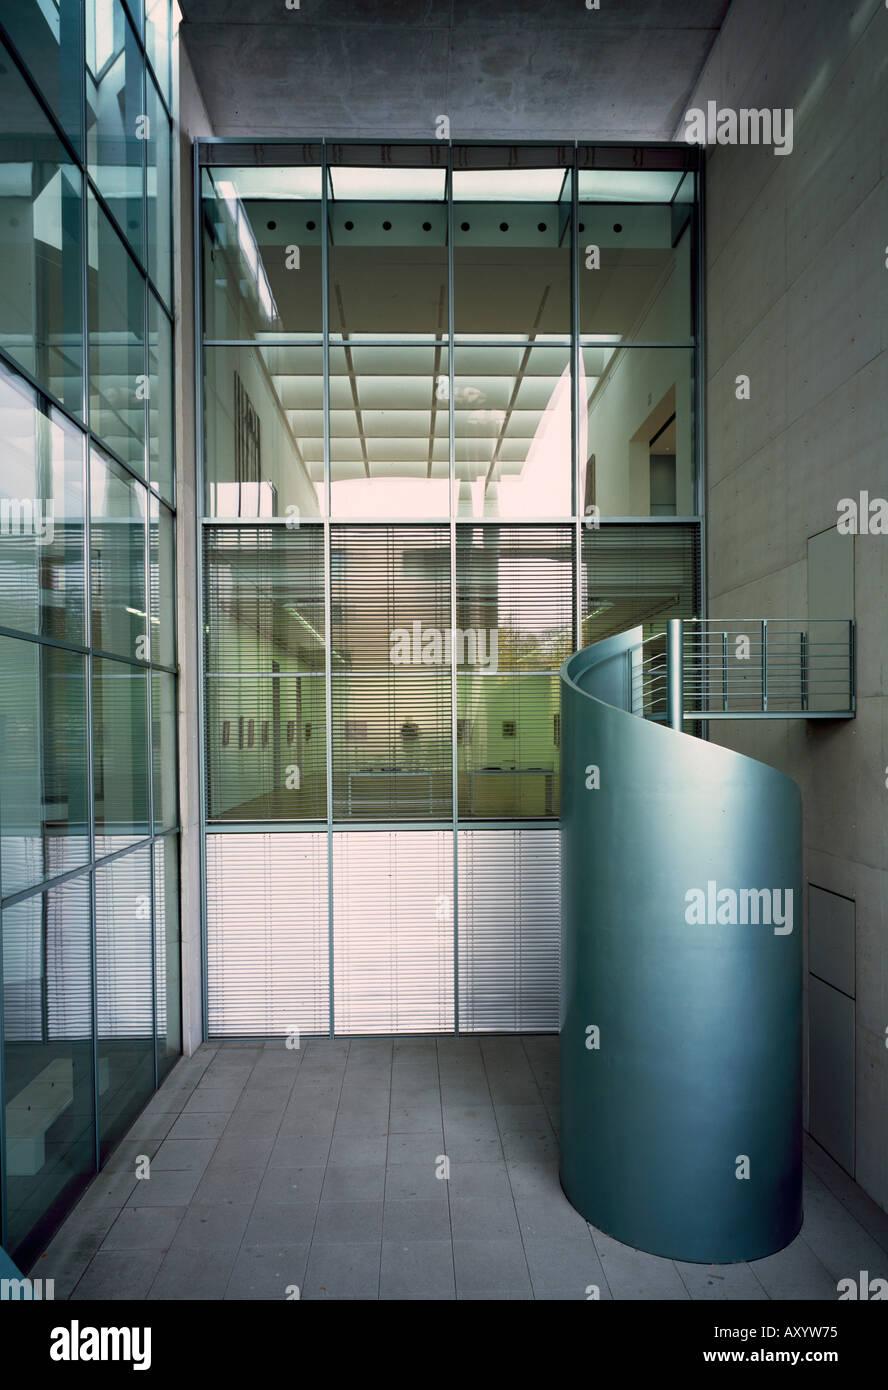 Architekt Bonn bonn kunstmuseum treppe architekt axel schultes stock photo